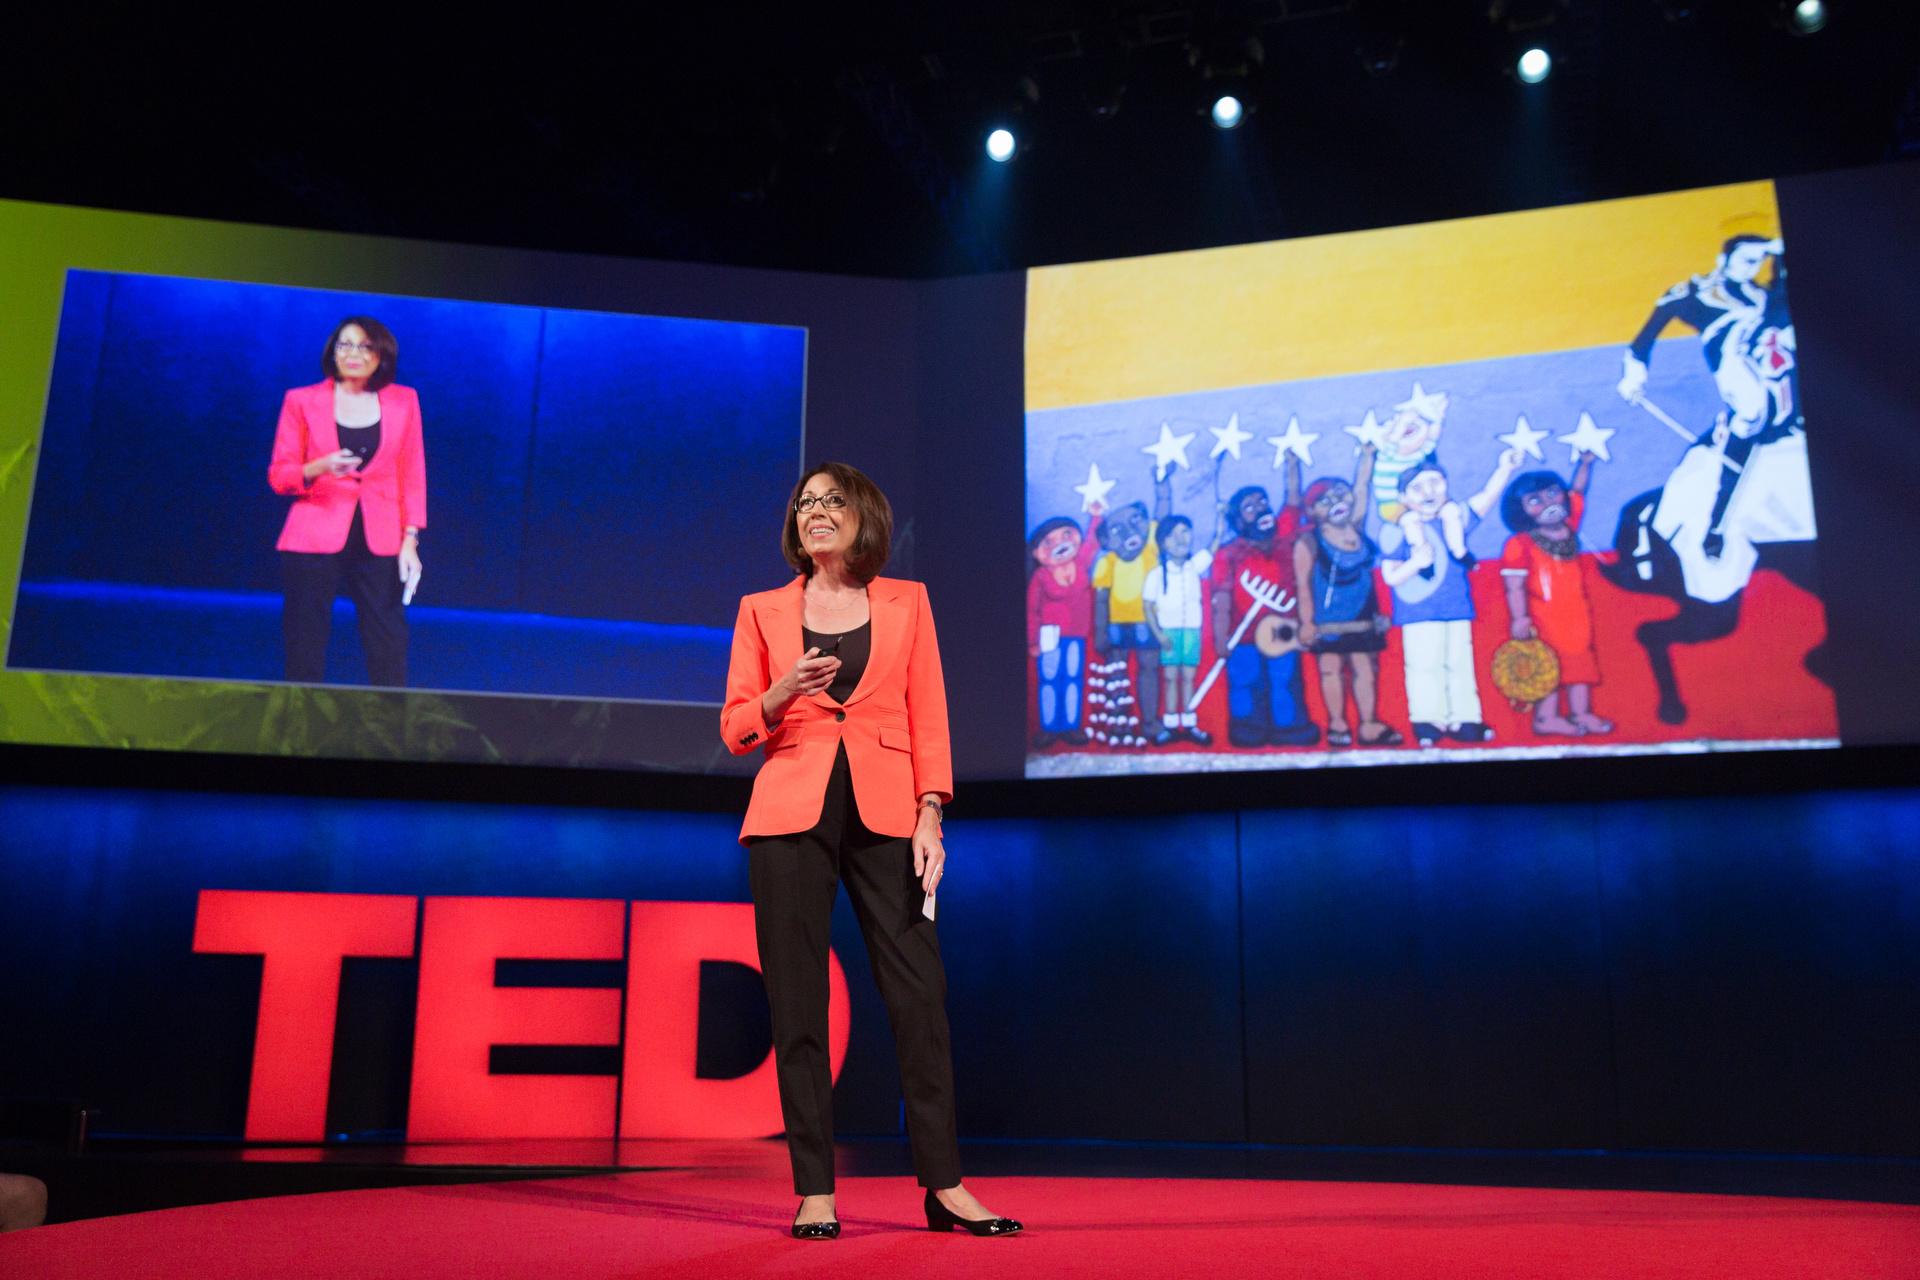 Marie Arana talks about the longevity of Simon Bolivar's legacy at TEDGlobal 2014. Photo: James Duncan Davidson